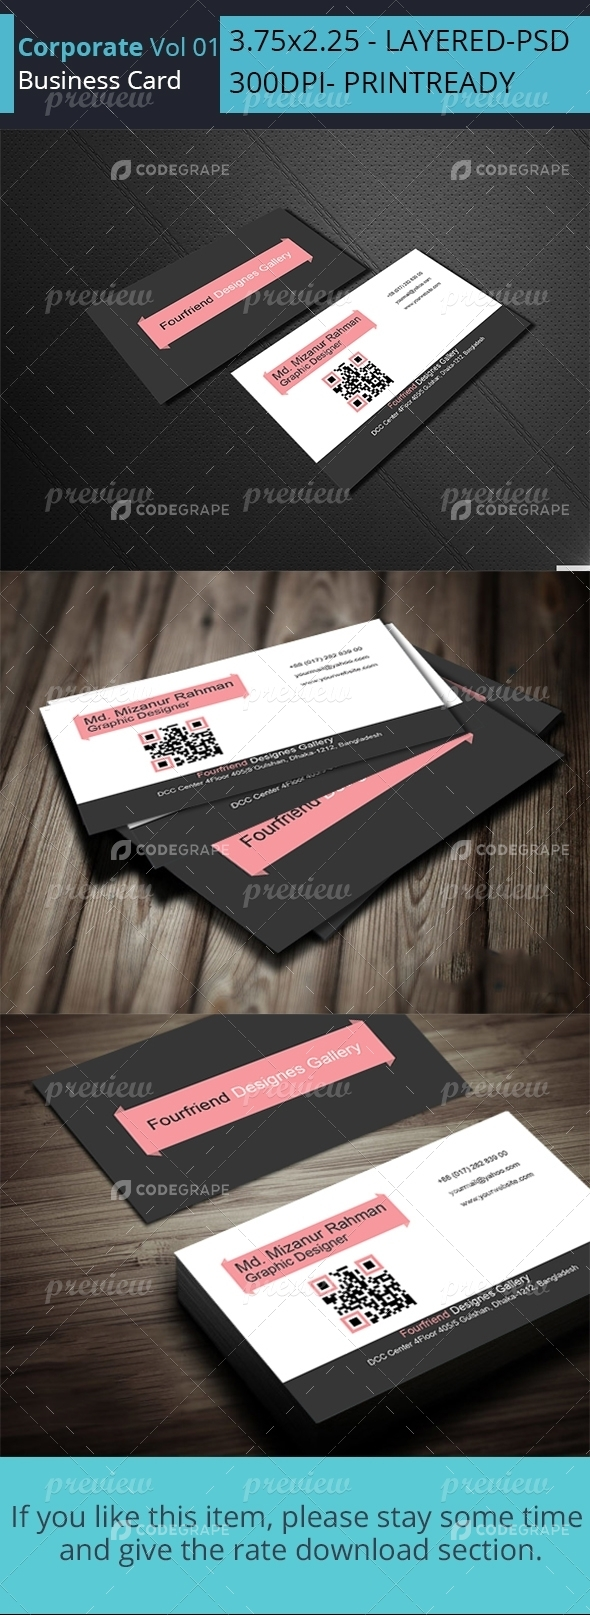 Corporate Business Card Vol 07